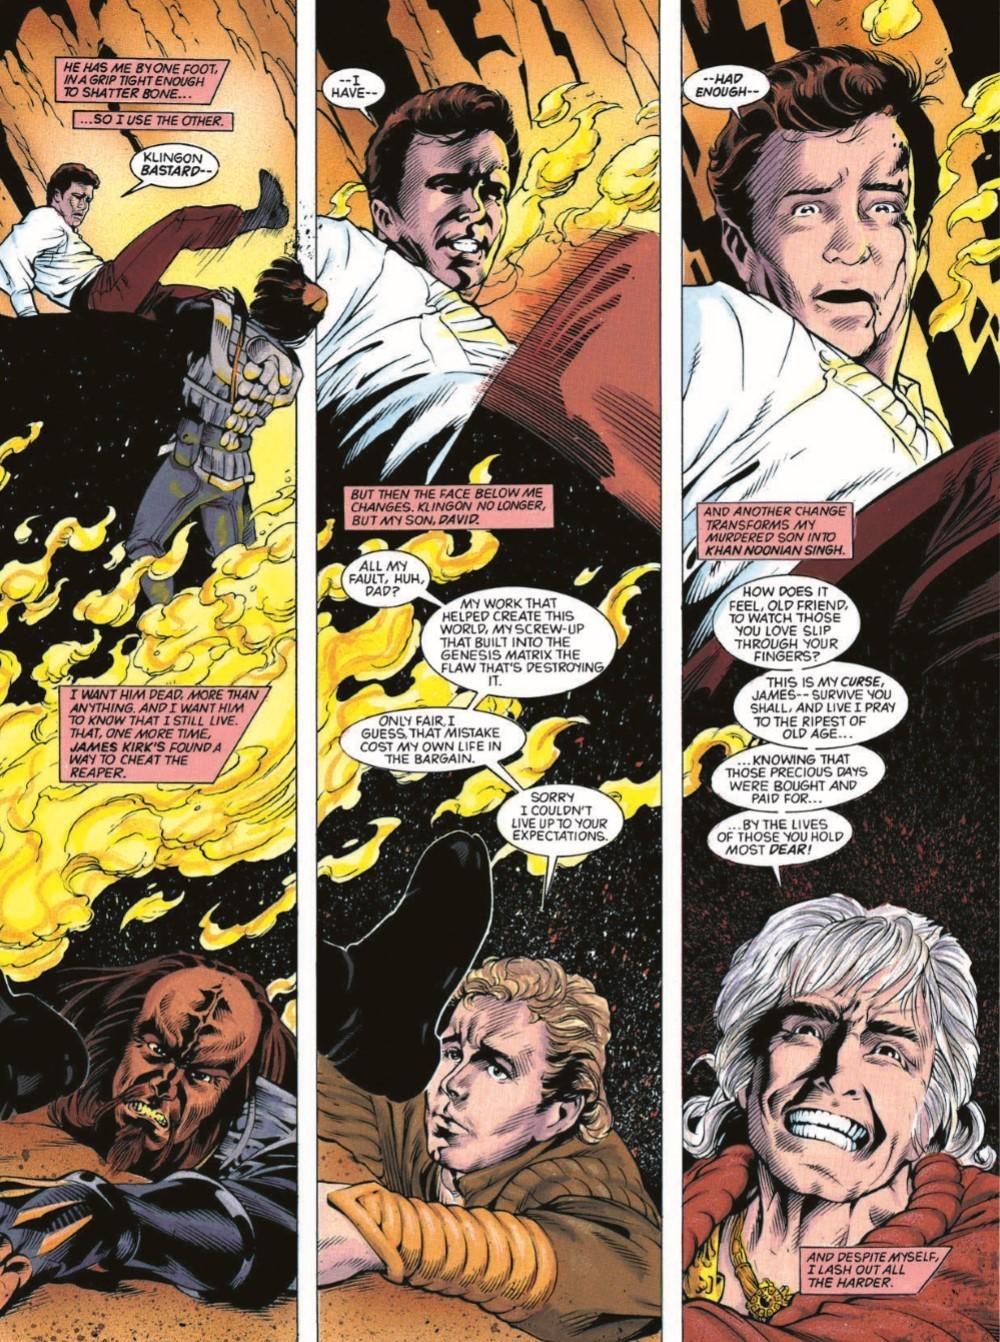 StarTrek_DebtofHonor-pr-5-1 ComicList Previews: STAR TREK DEBT OF HONOR CLASSIC EDITION GN